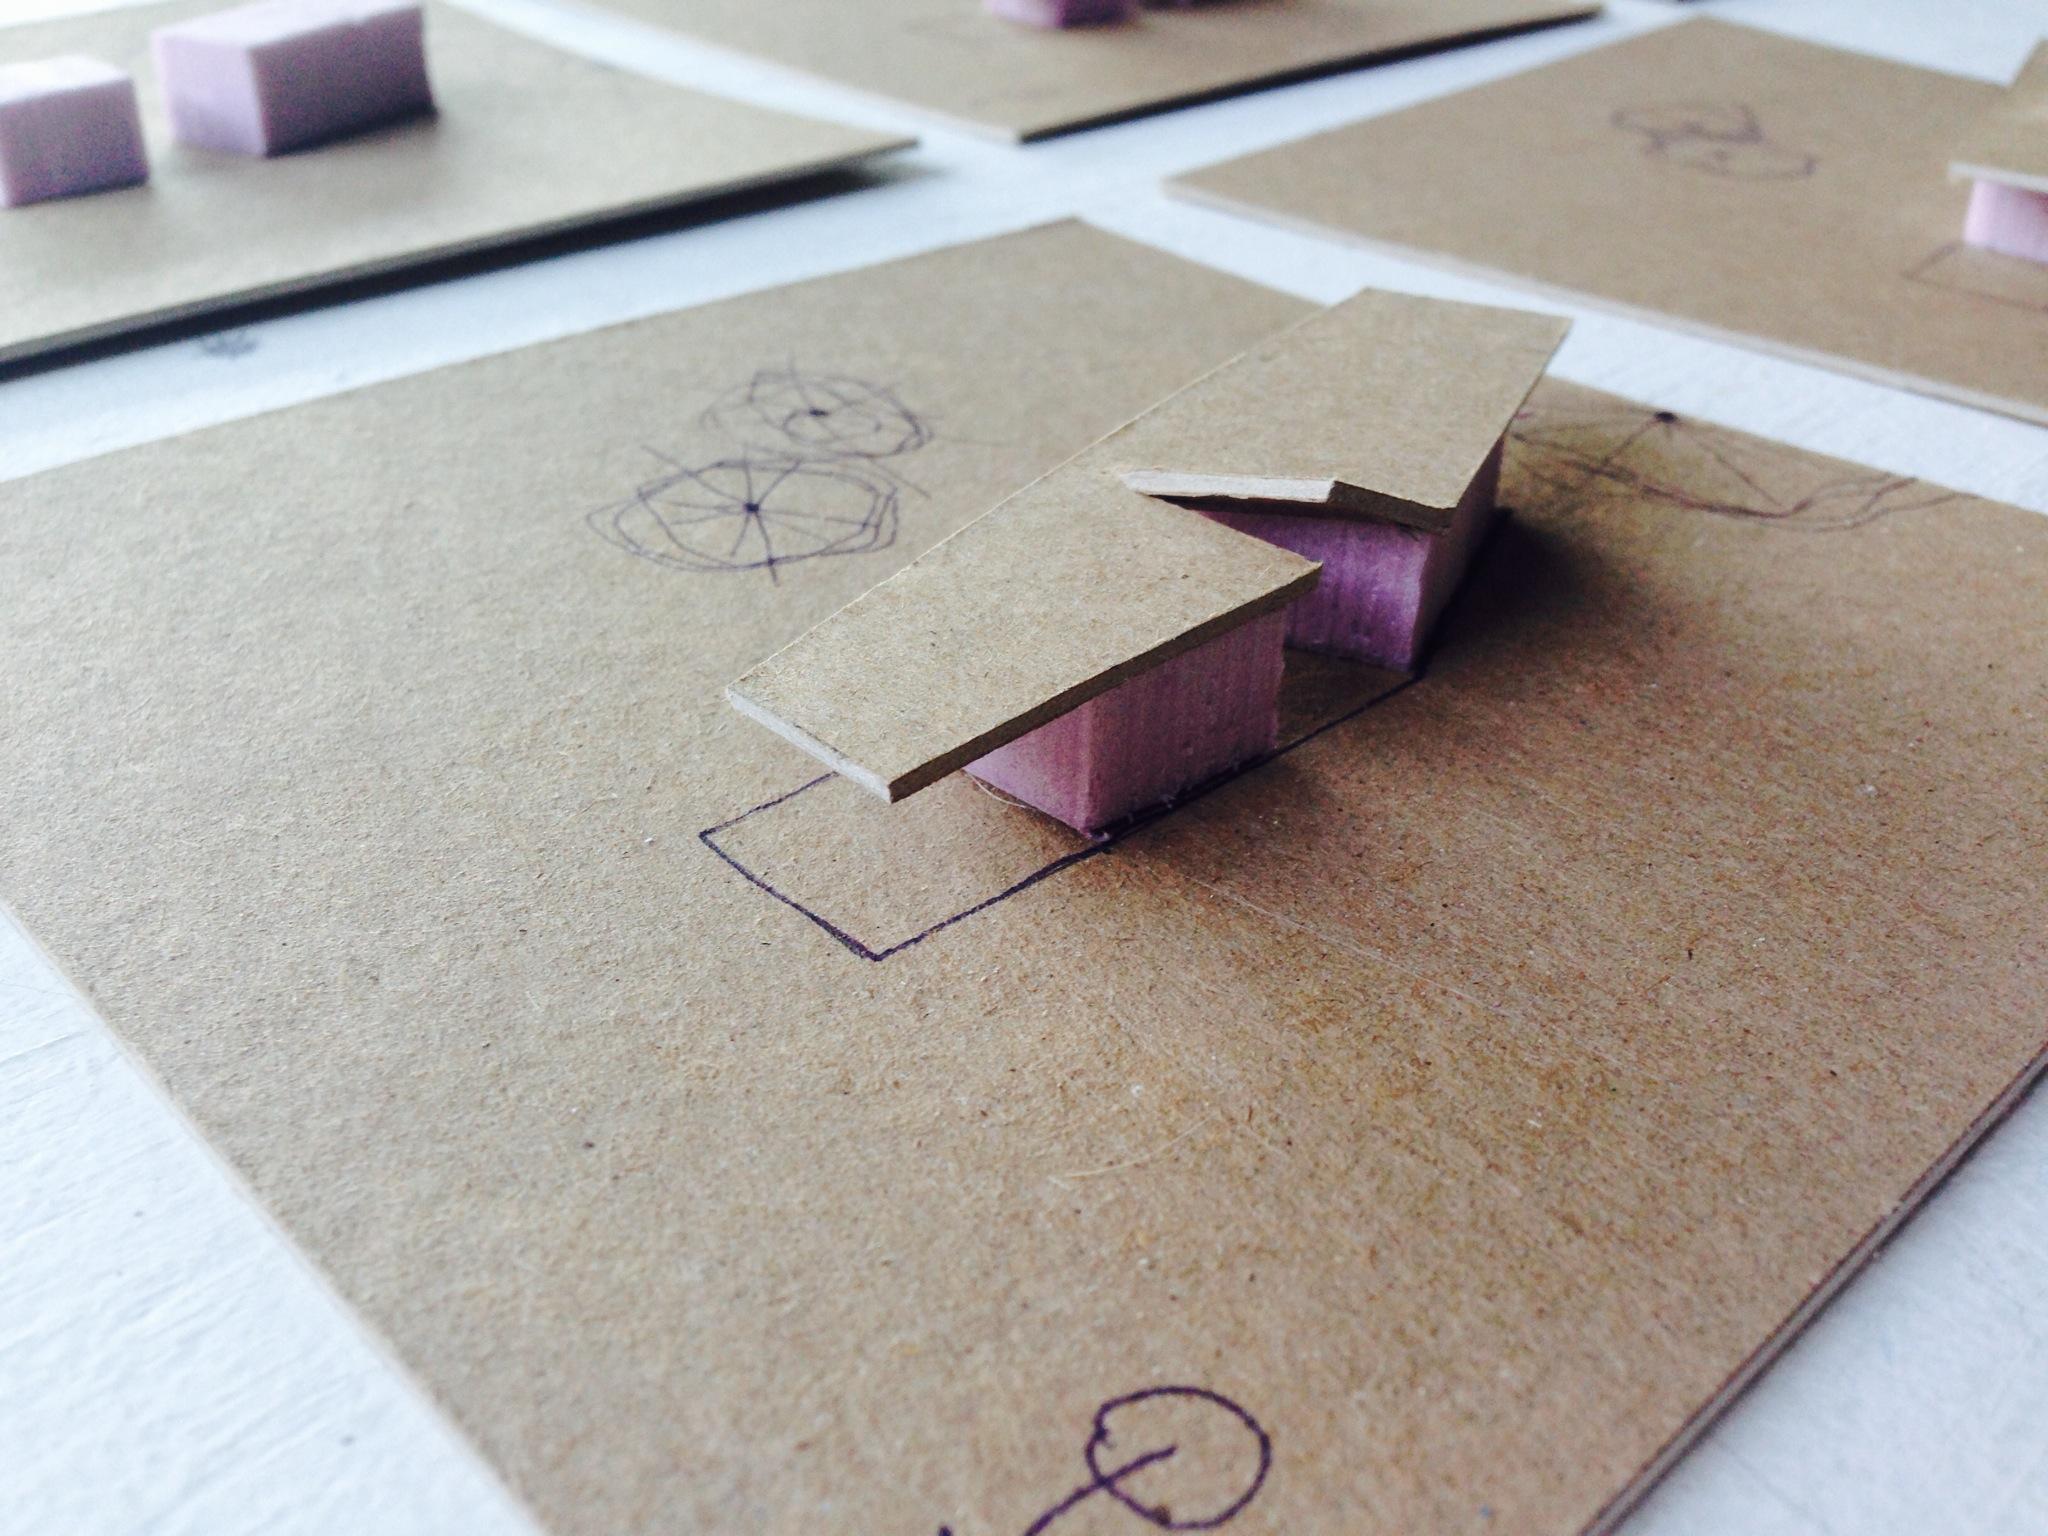 TALLstudio Schematic Design Massing Model_3